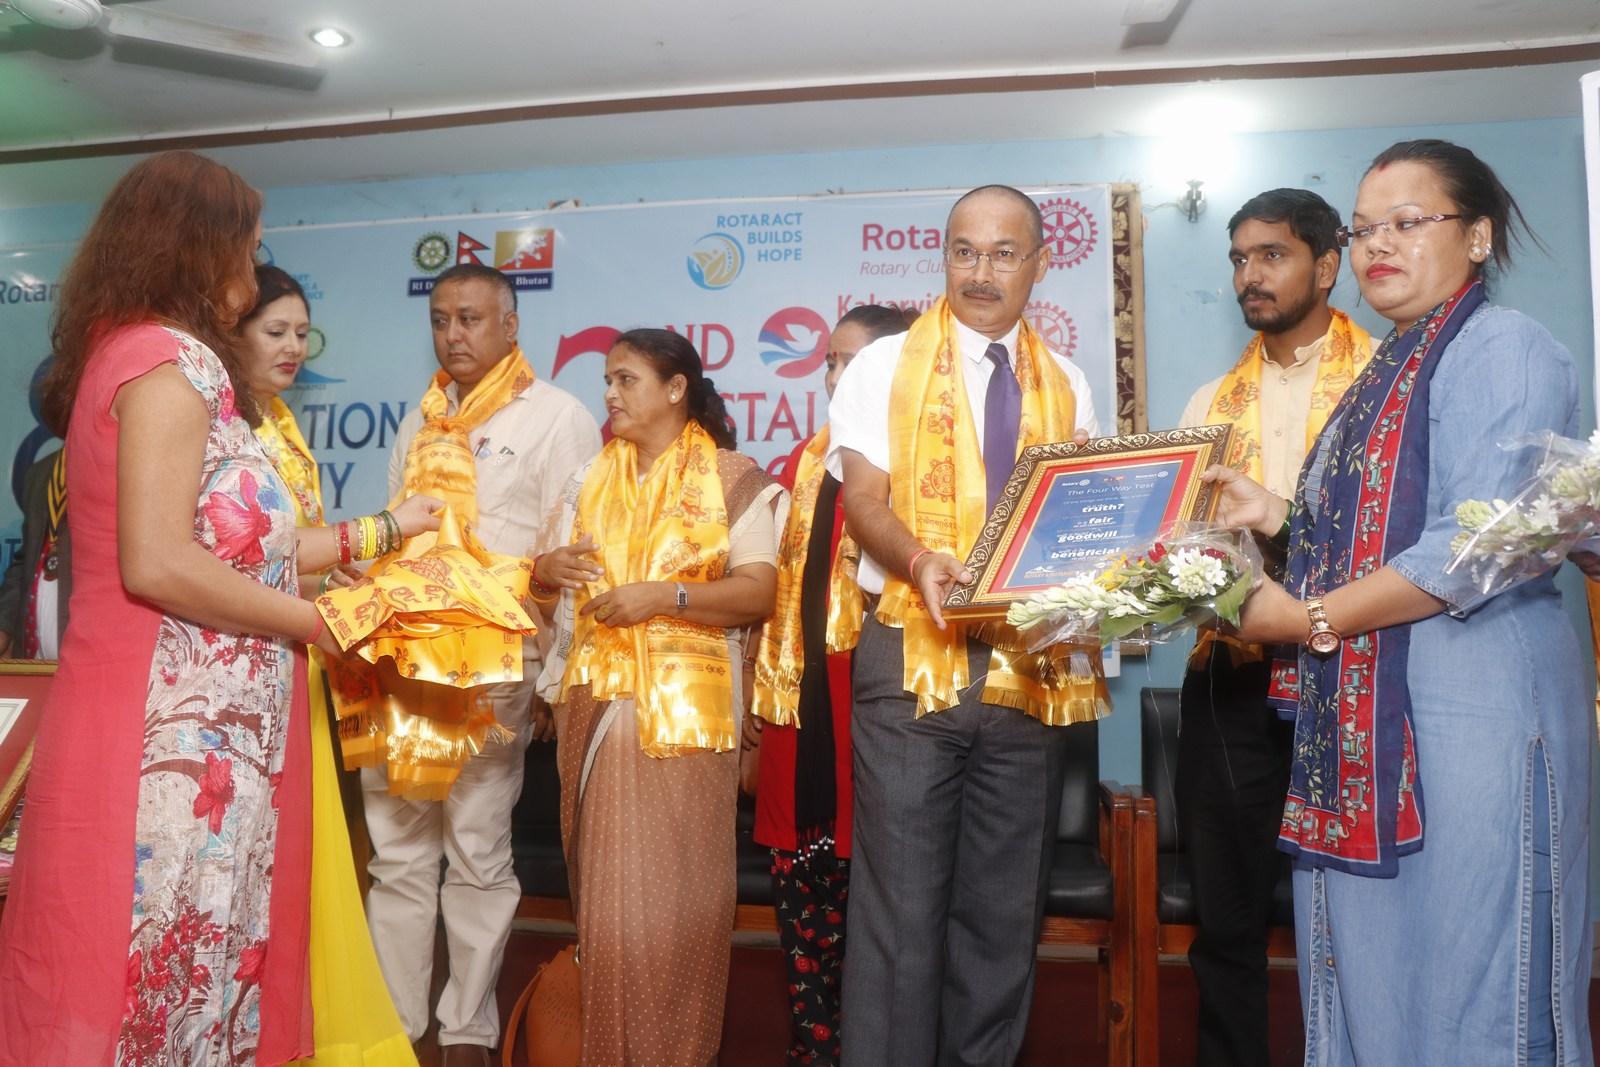 8th-Installation-Ceremony-Rotary-Club-of-Kakarvitta-86